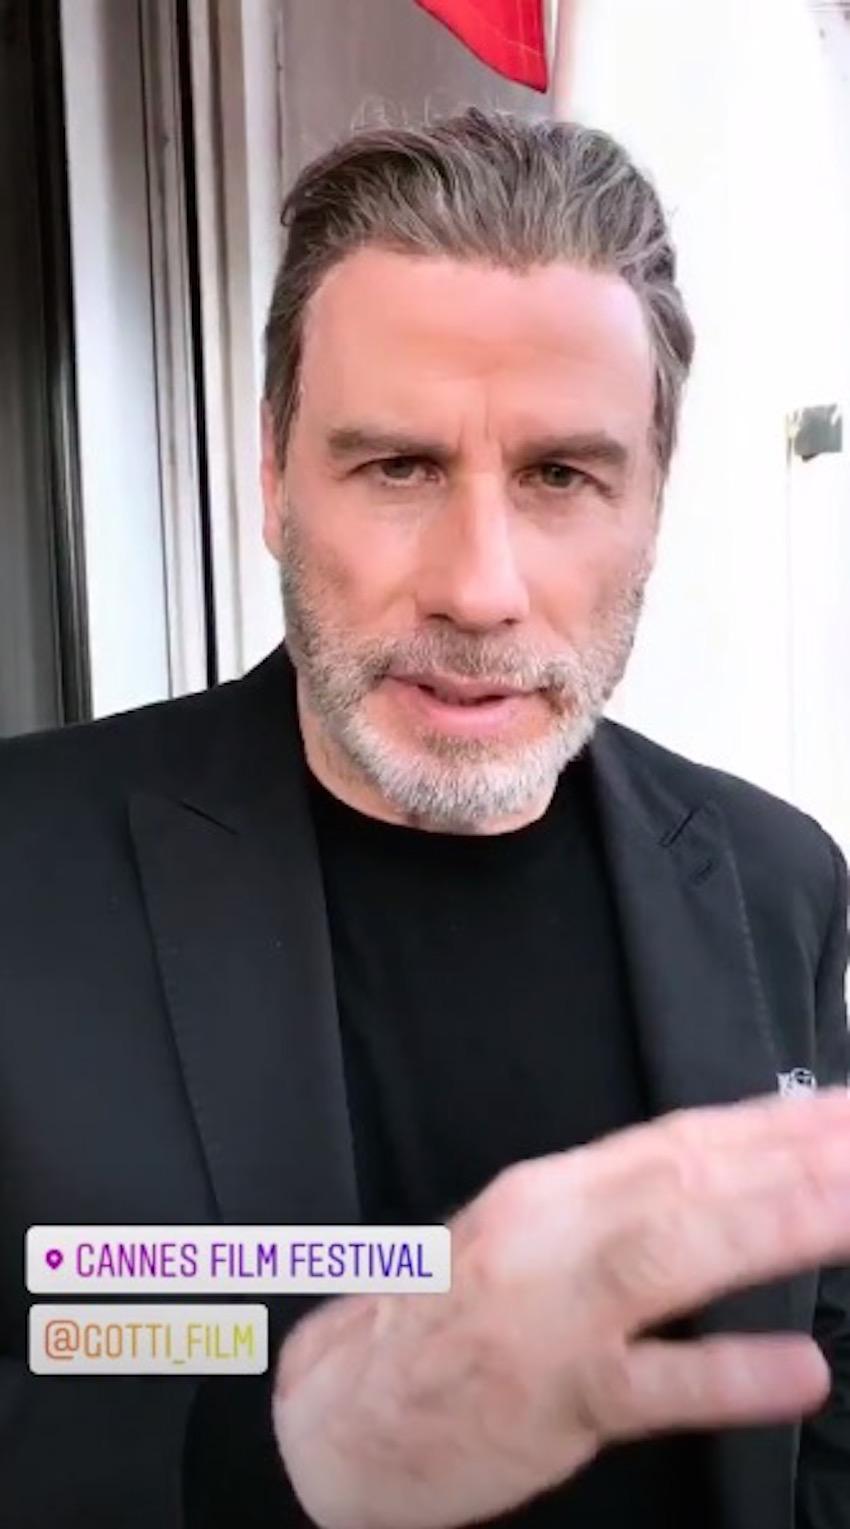 john travolta instagram